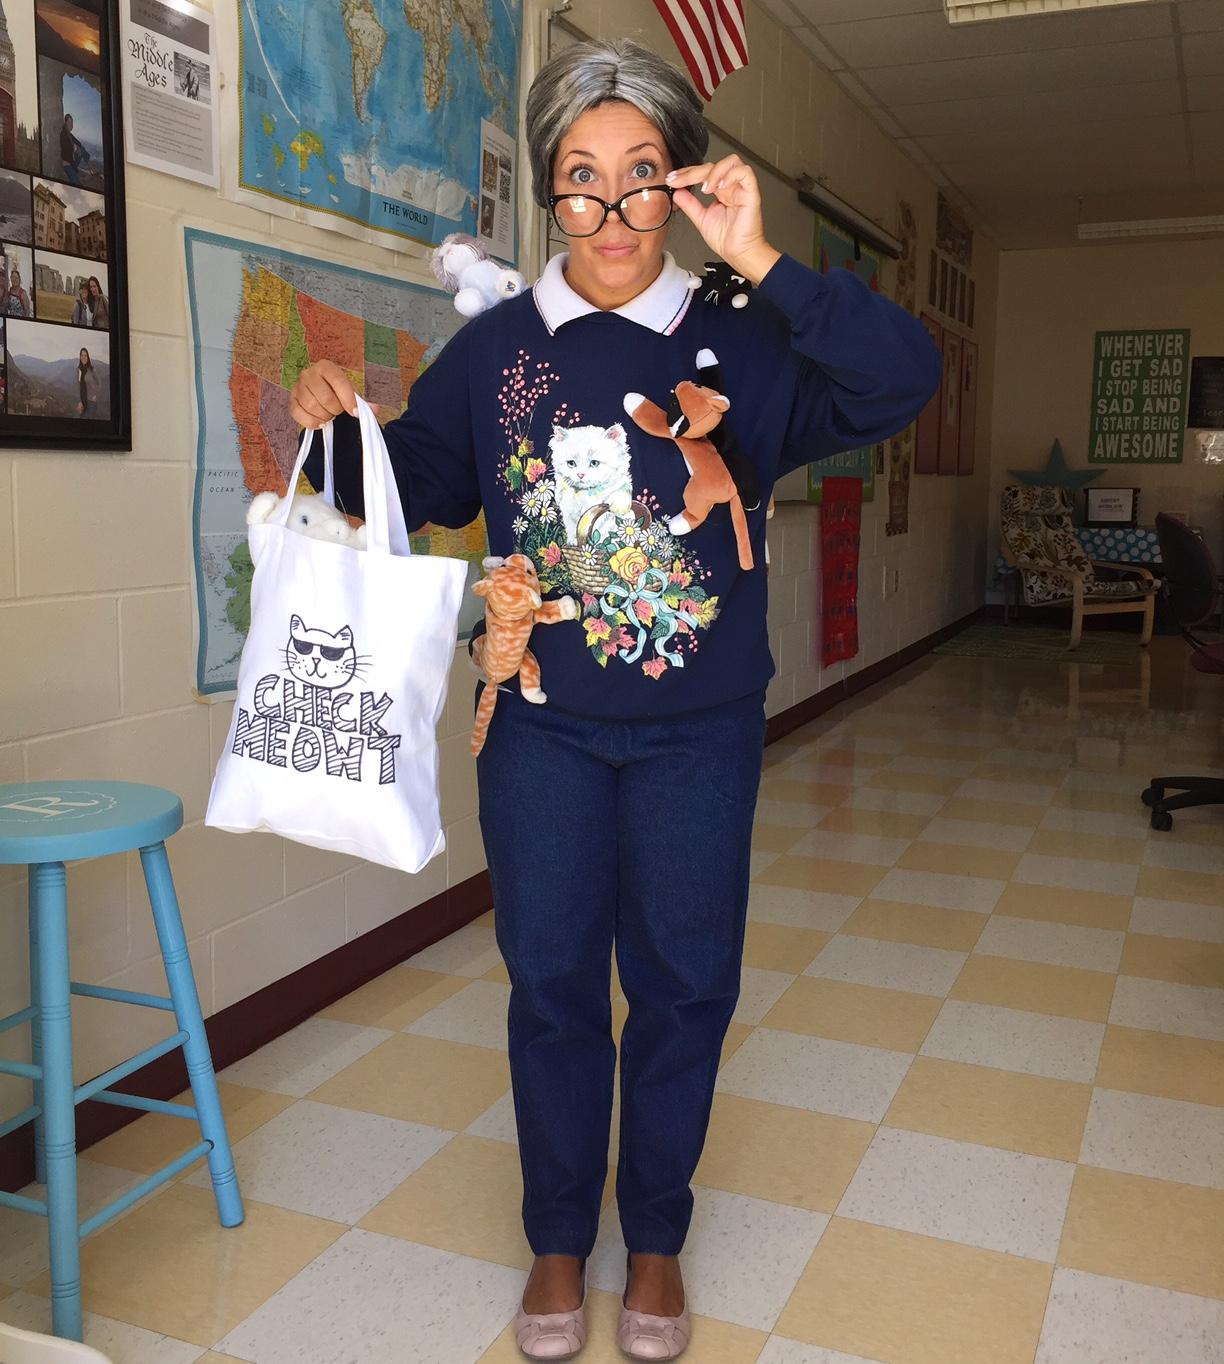 & Crafty Teacher Lady: Teacher Friendly Halloween Costume Ideas